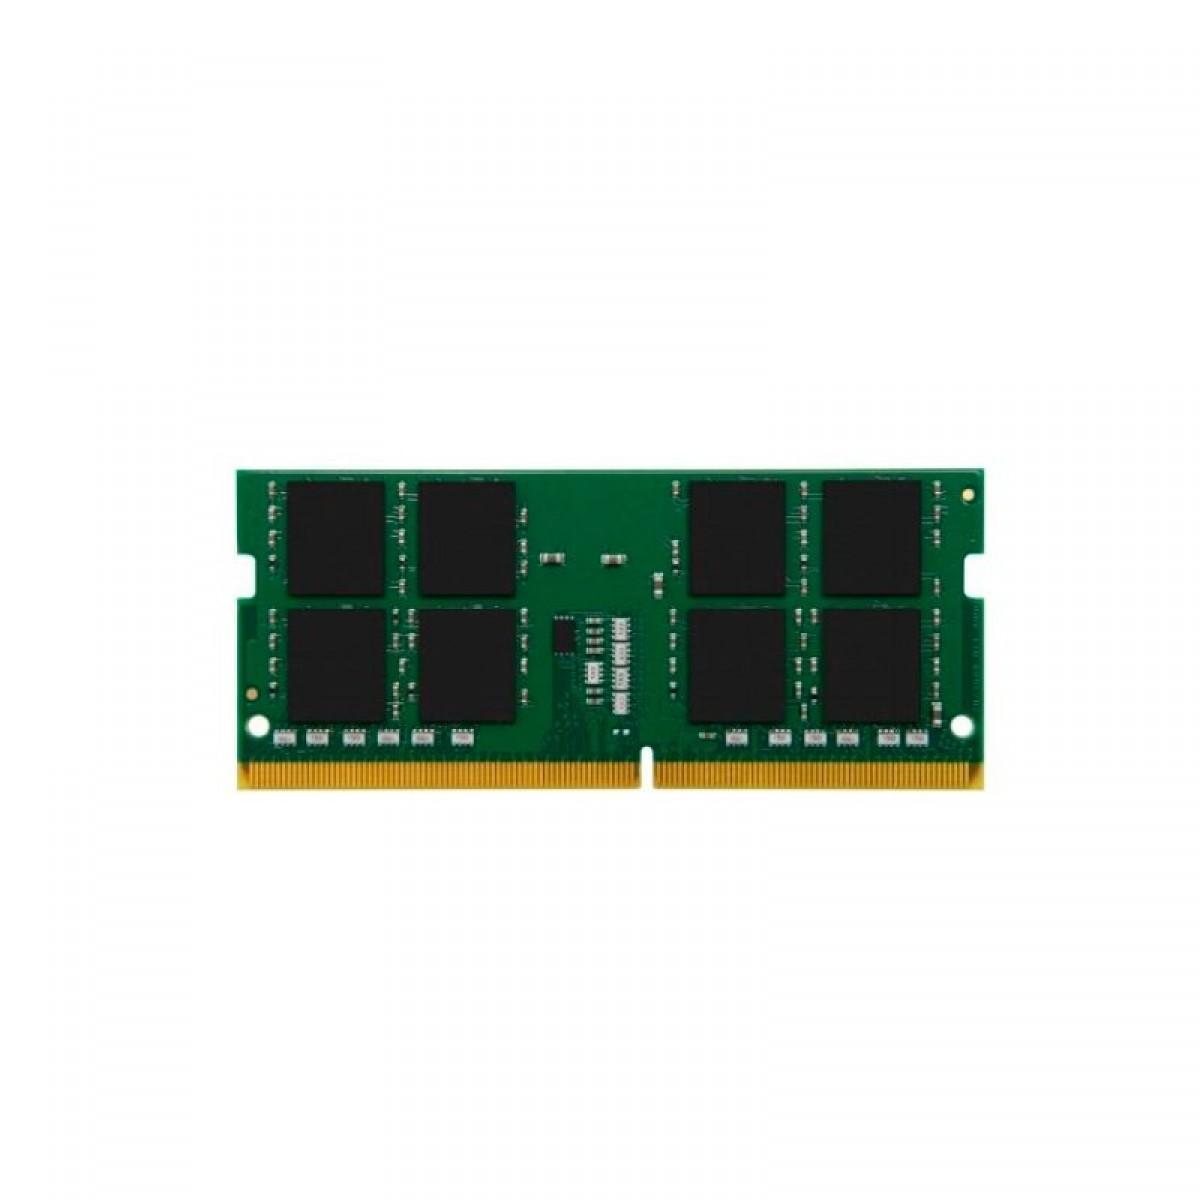 Memória para Notebook DDR4 Kingston, 4GB, 2666MHz, KVR26S19S6/4